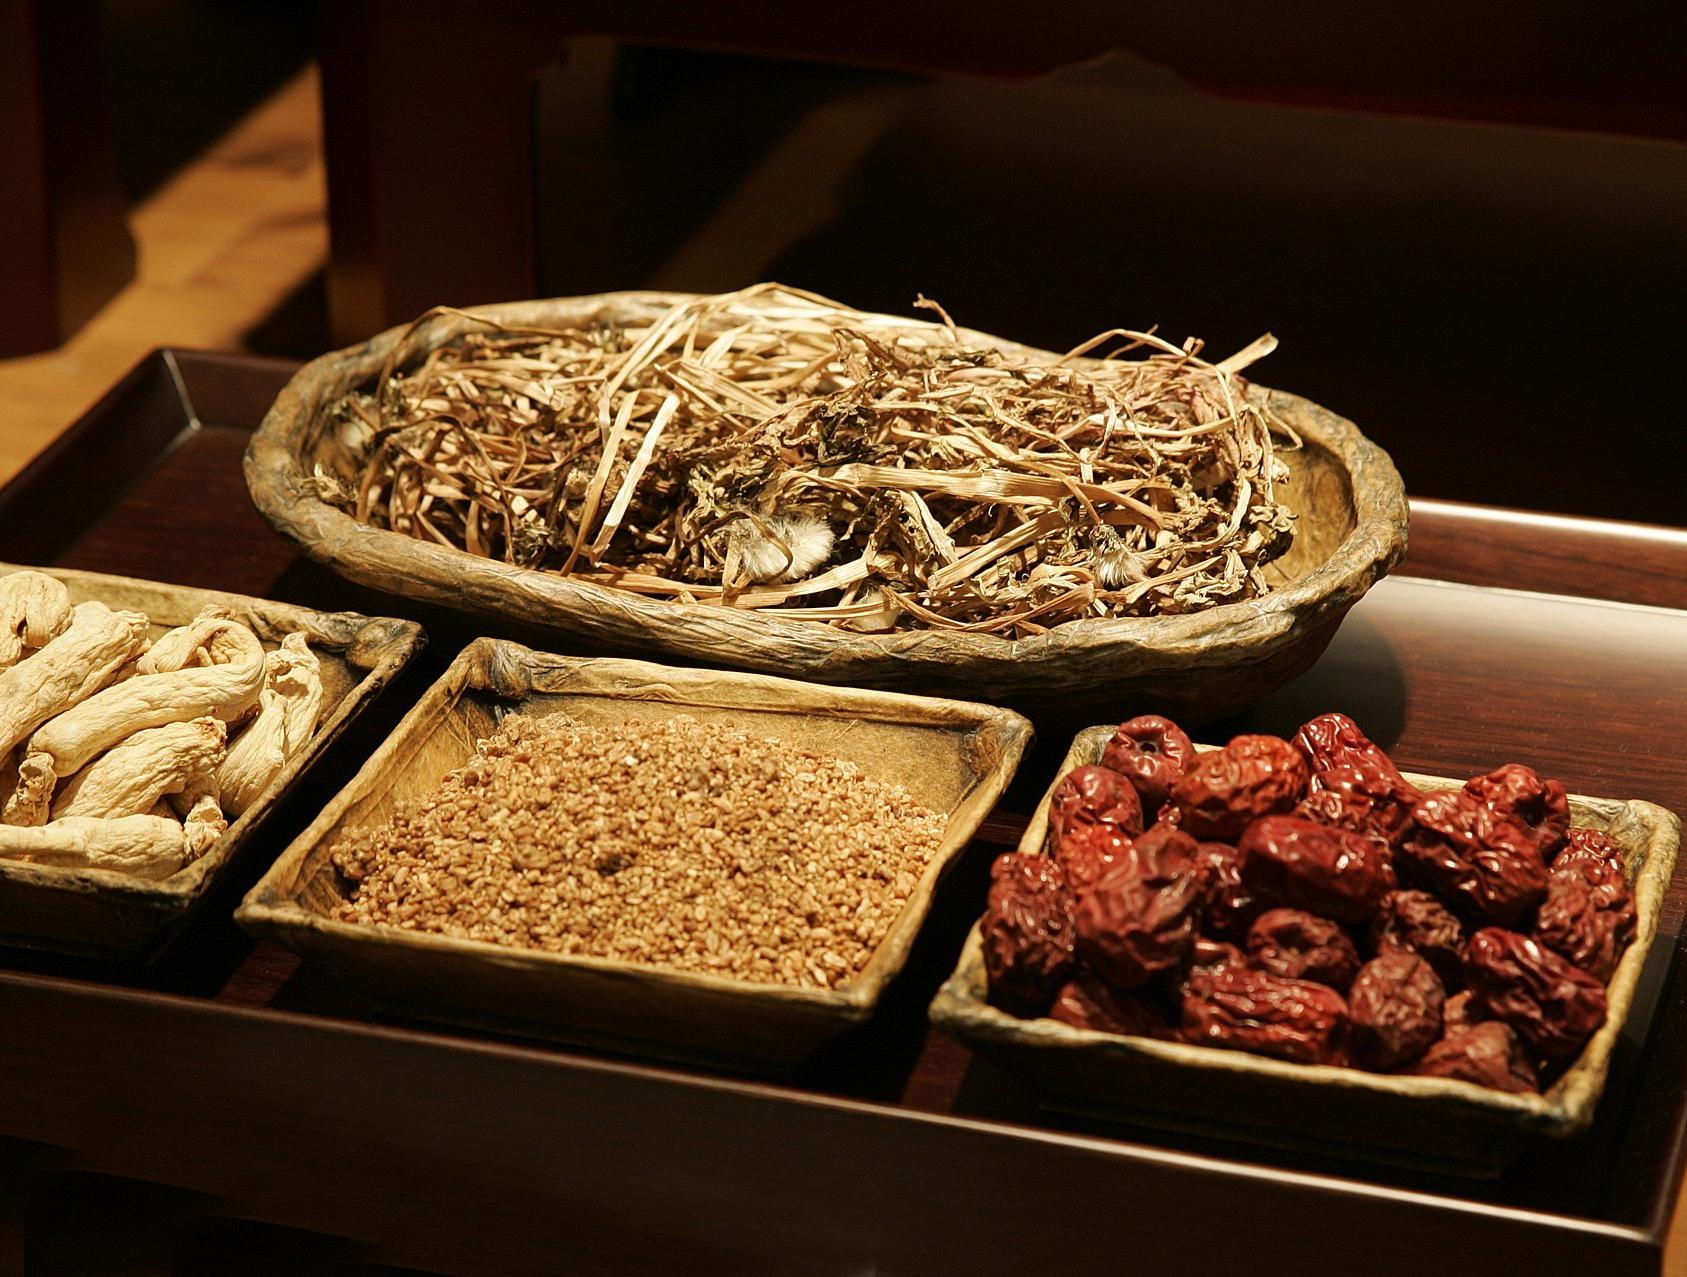 chinese-medicine-2178253_1920